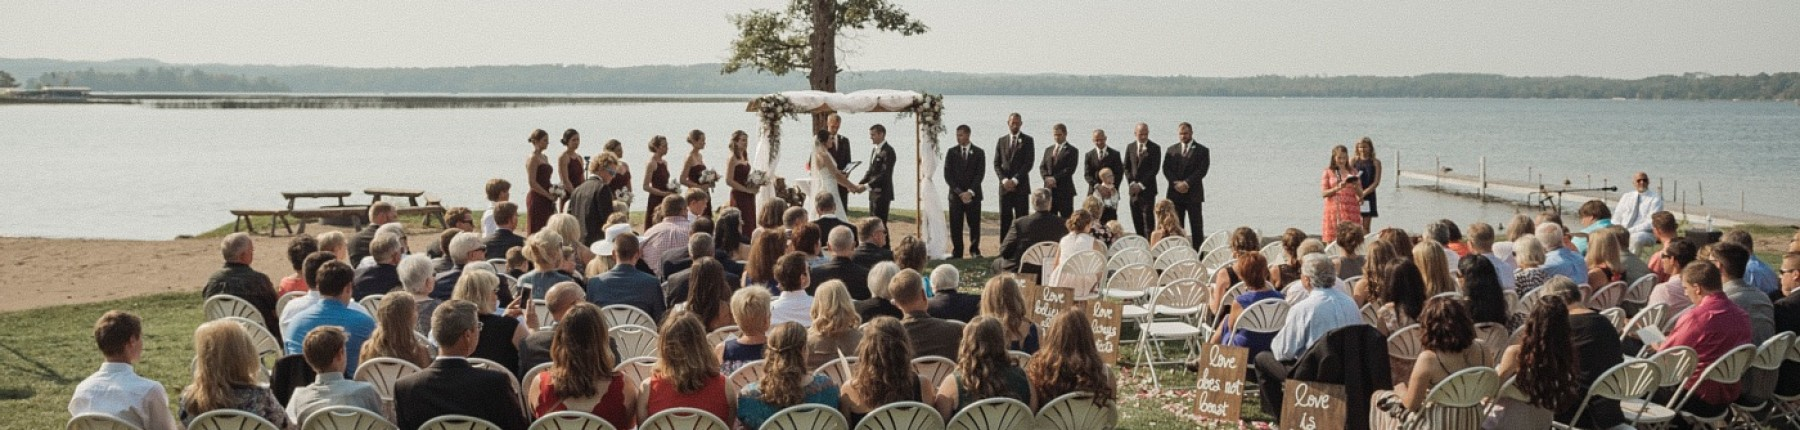 Outdoor lakeside wedding ceremony